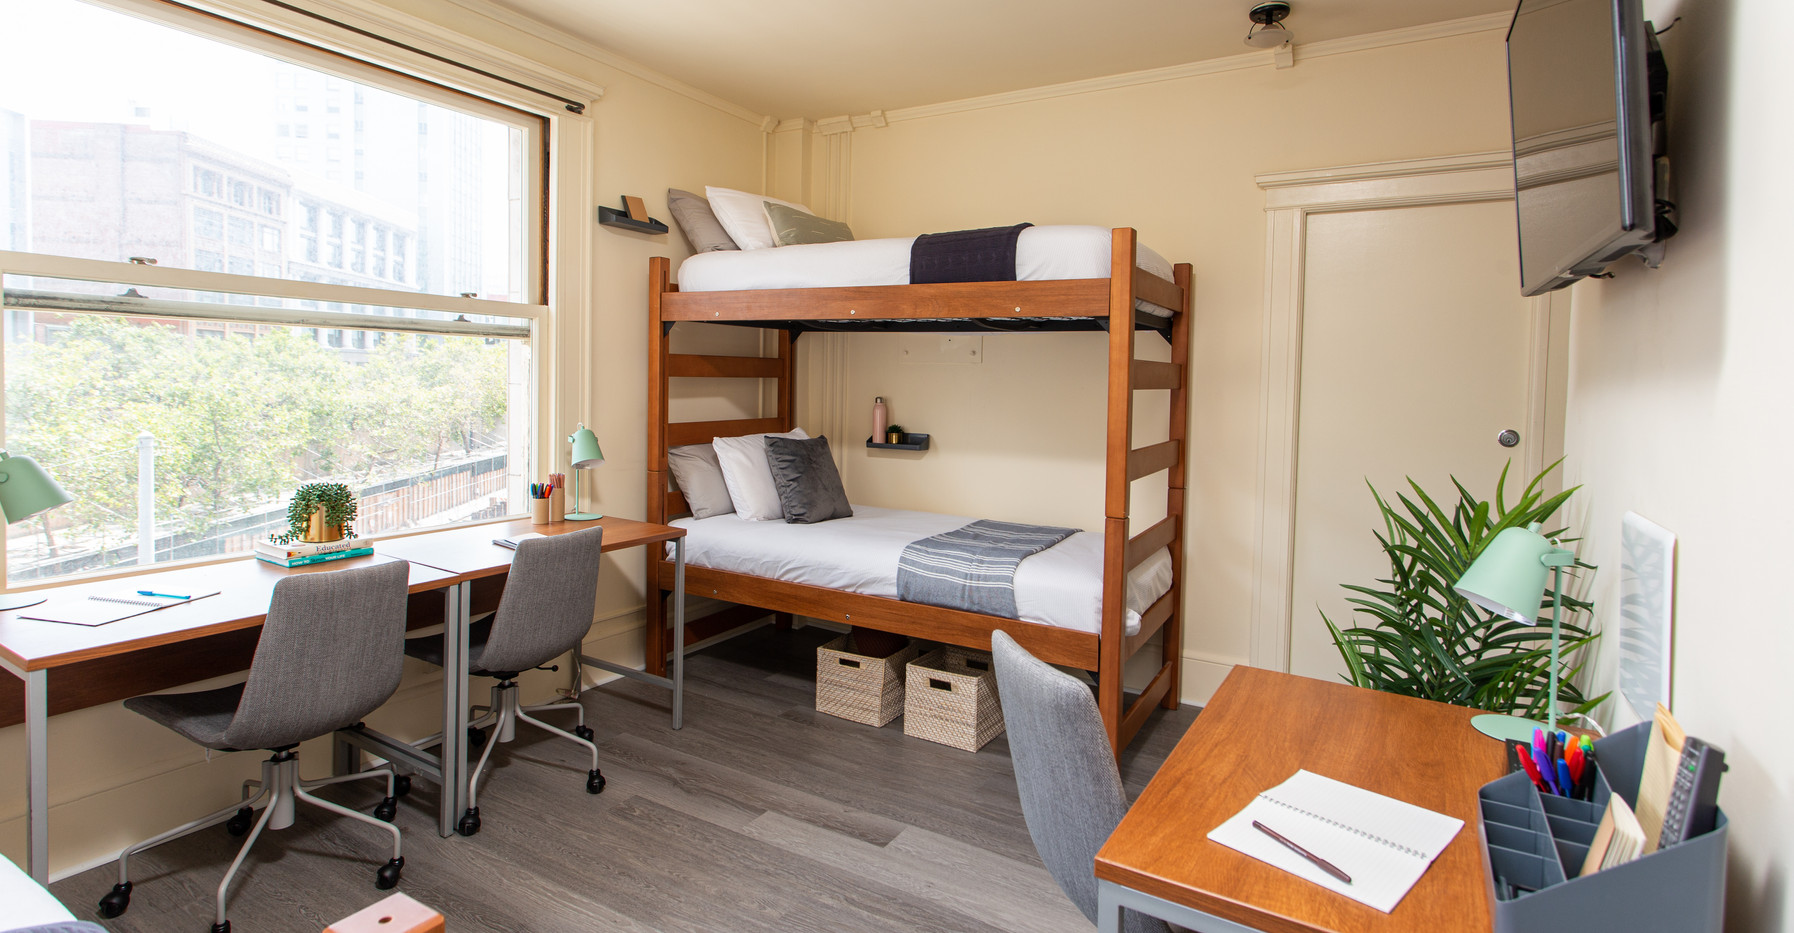 San Francisco student room 7